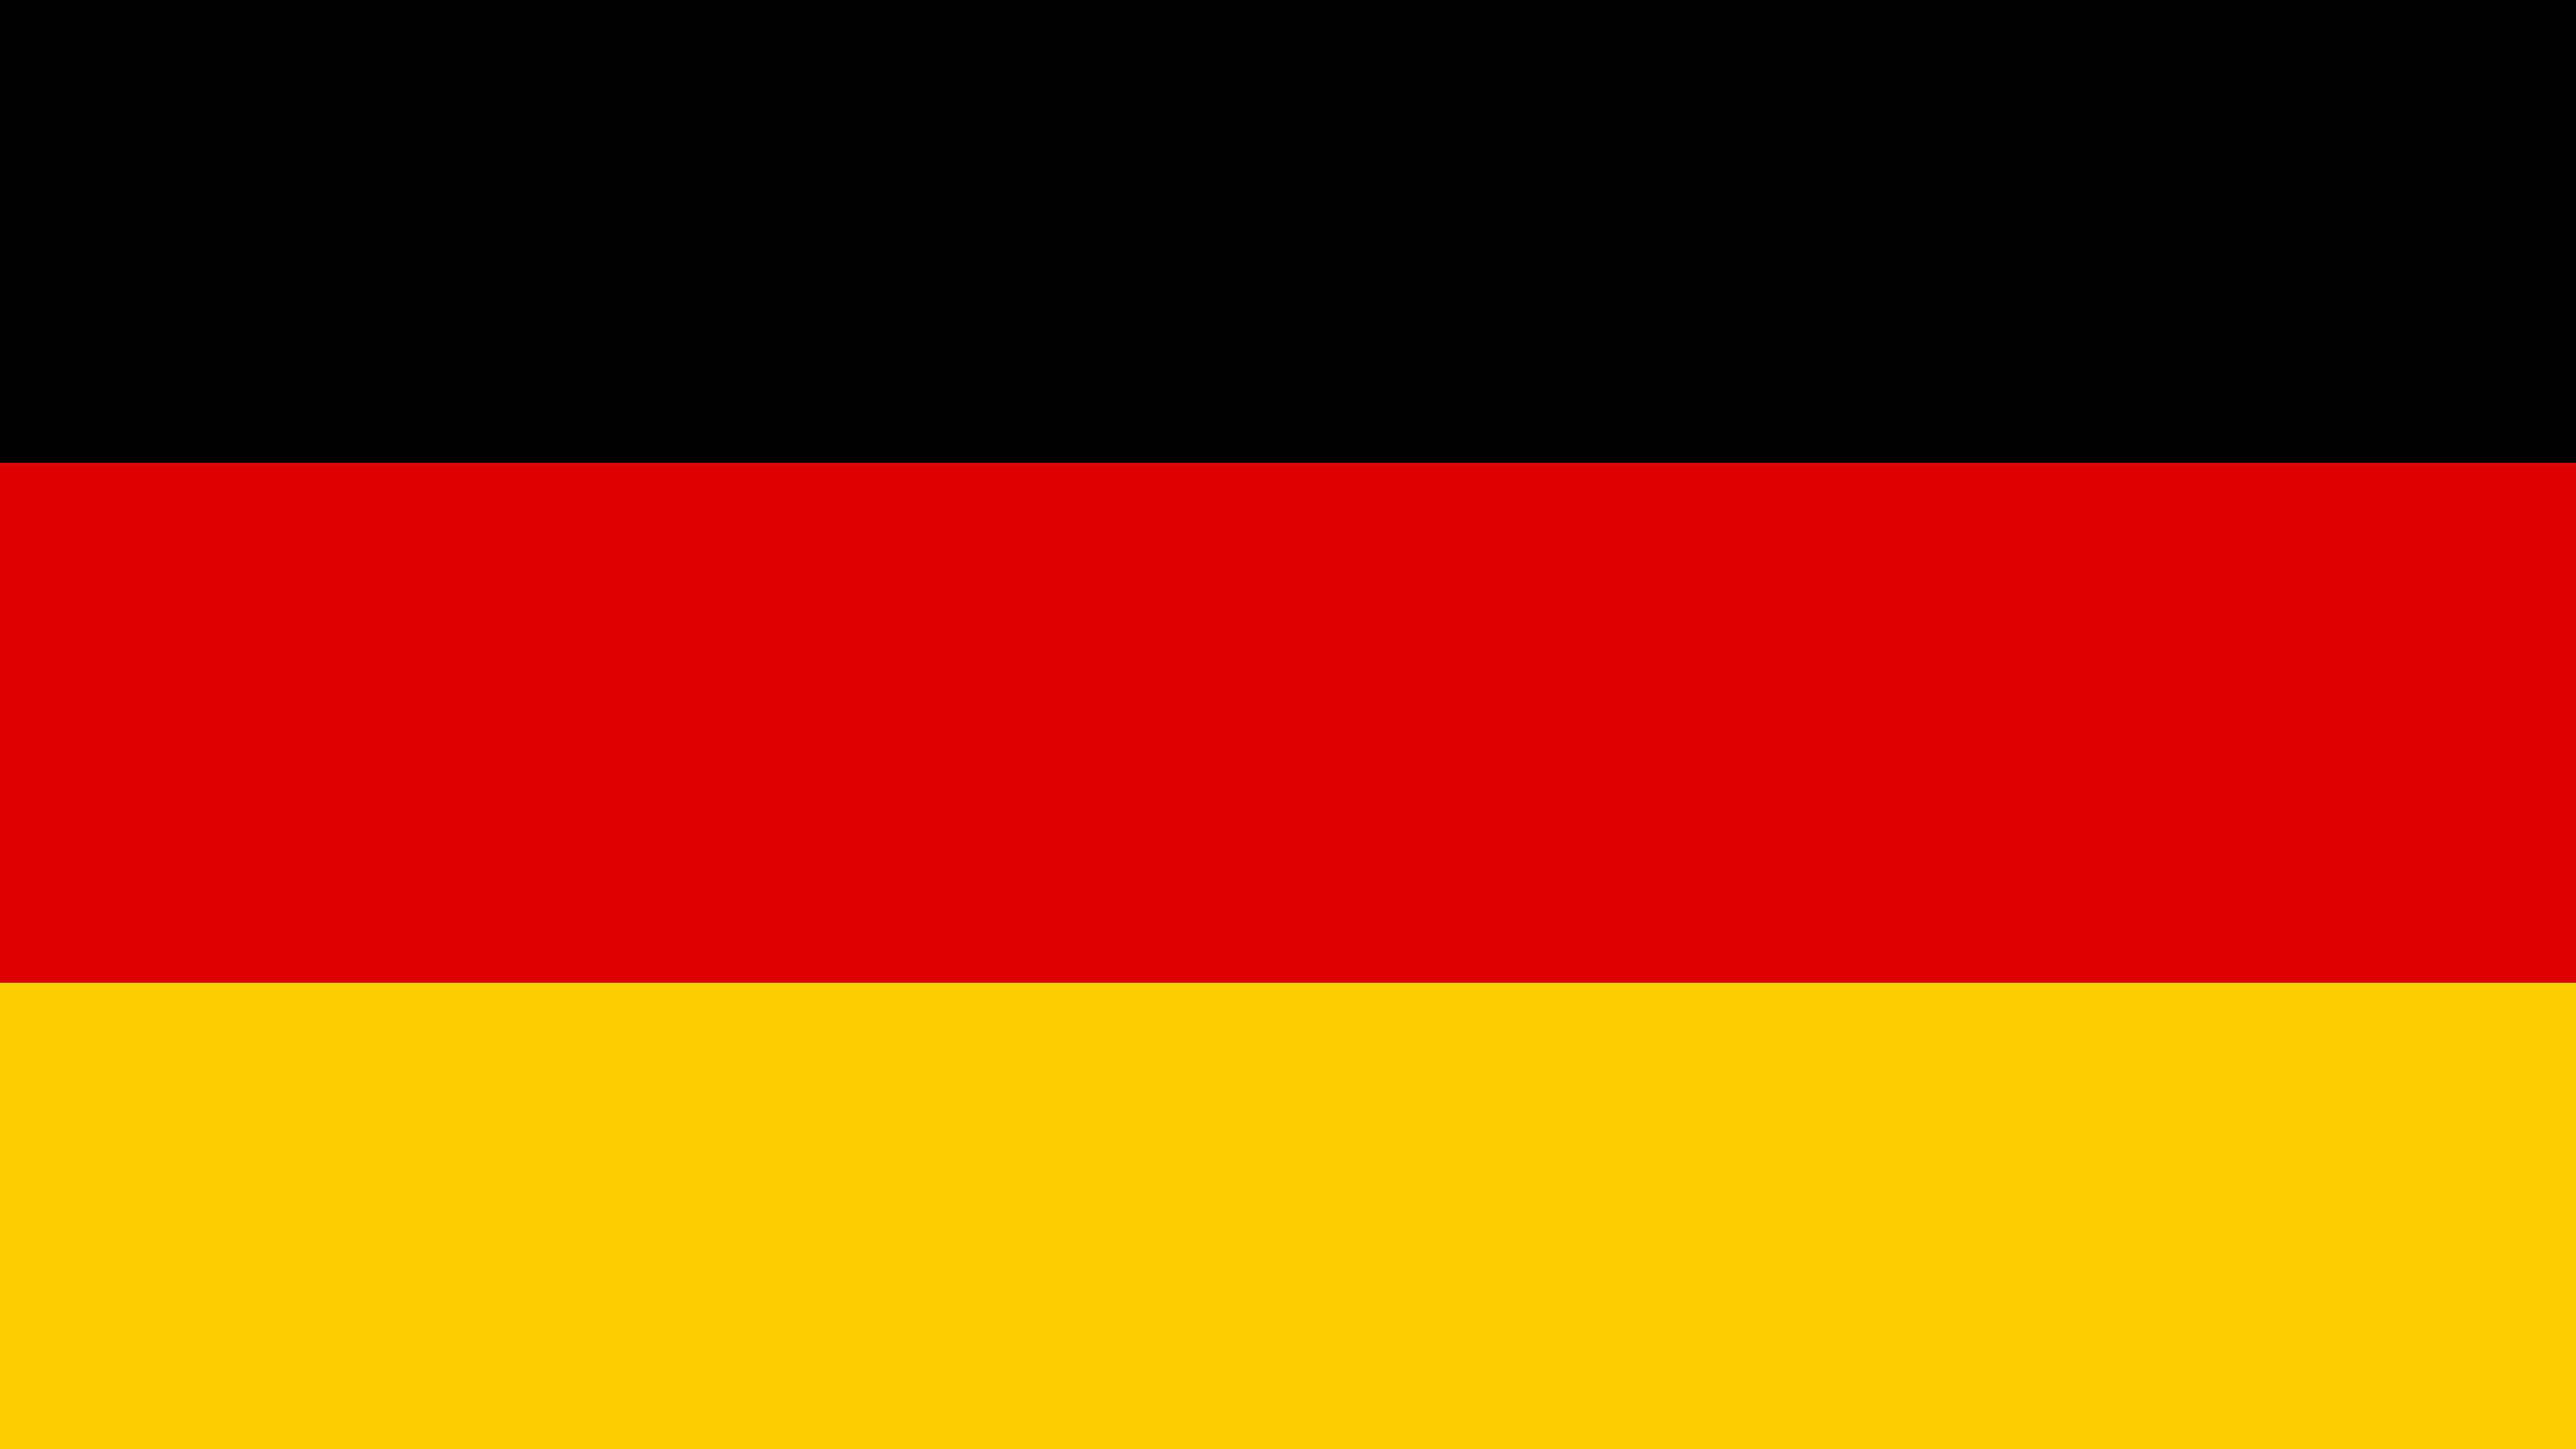 germany flag uhd 4k wallpaper